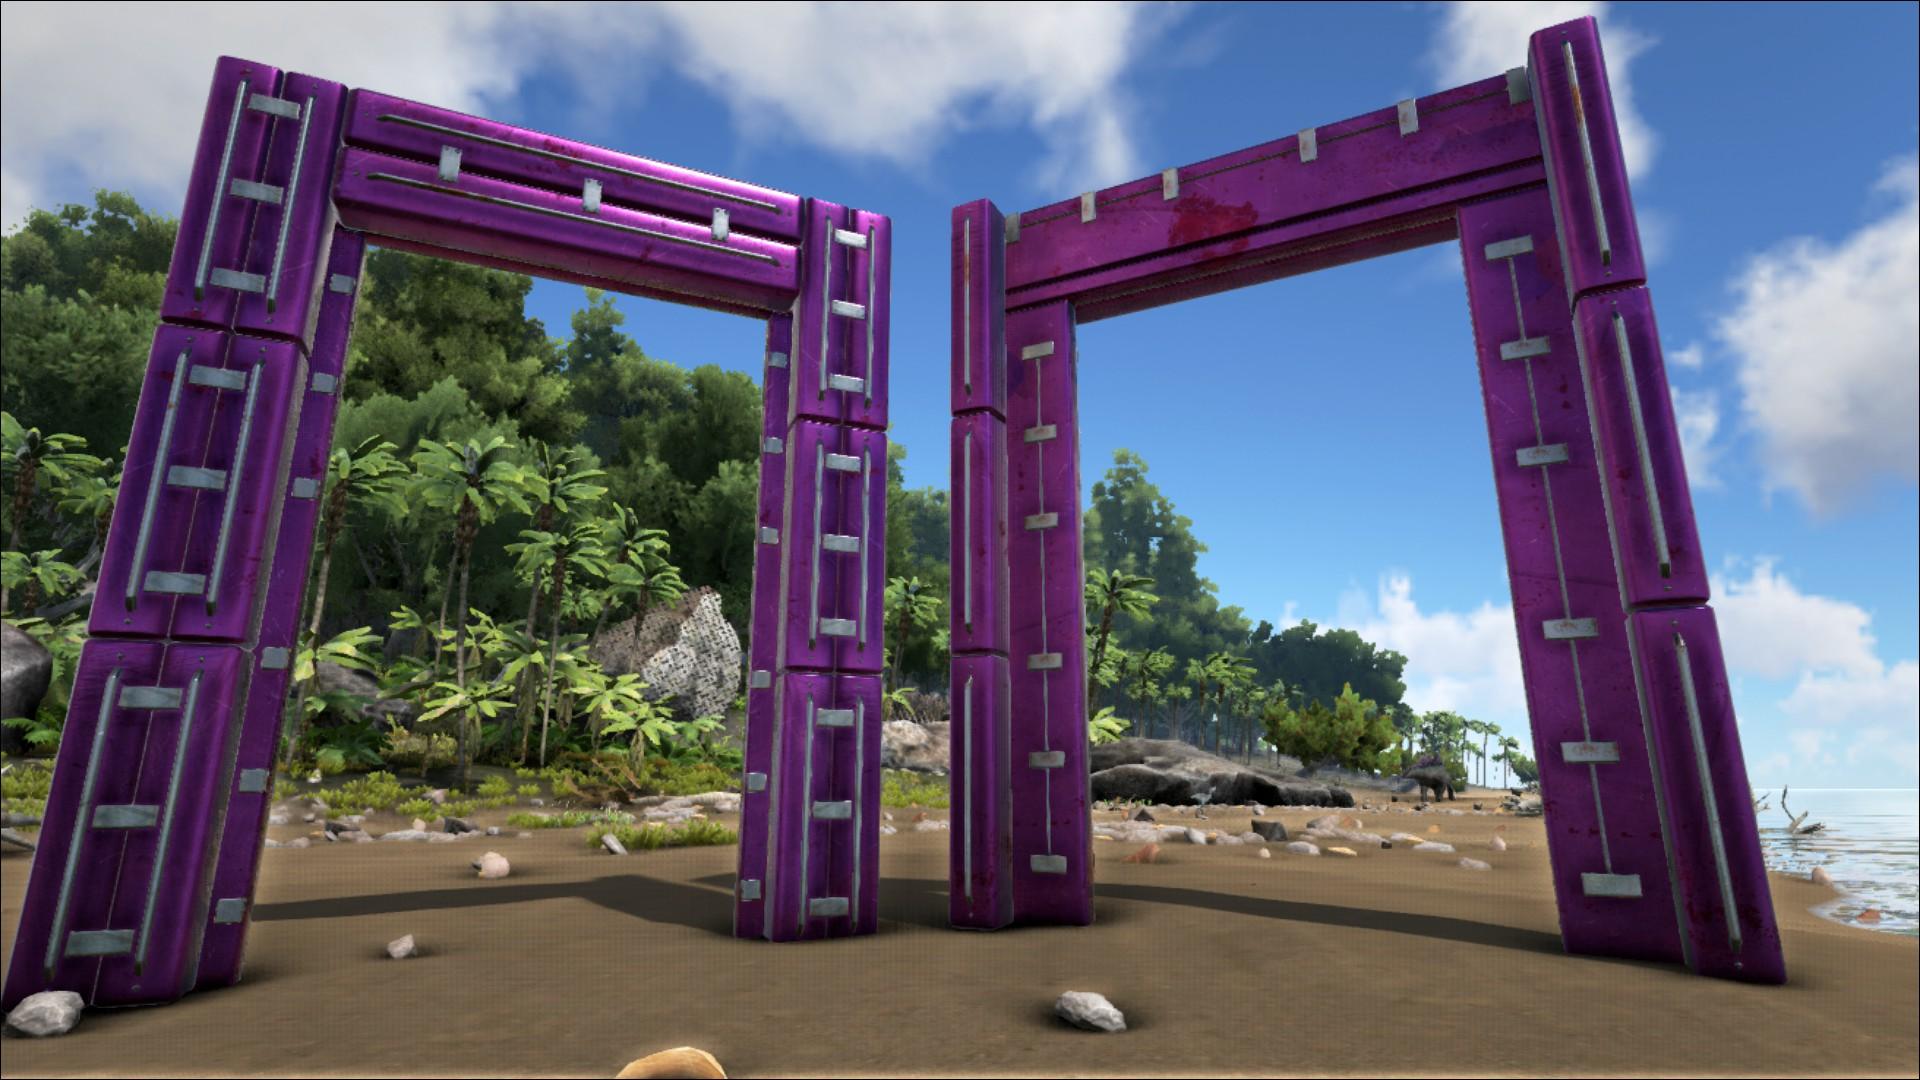 Metal Dinosaur Gateway - Official ARK: Survival Evolved Wiki